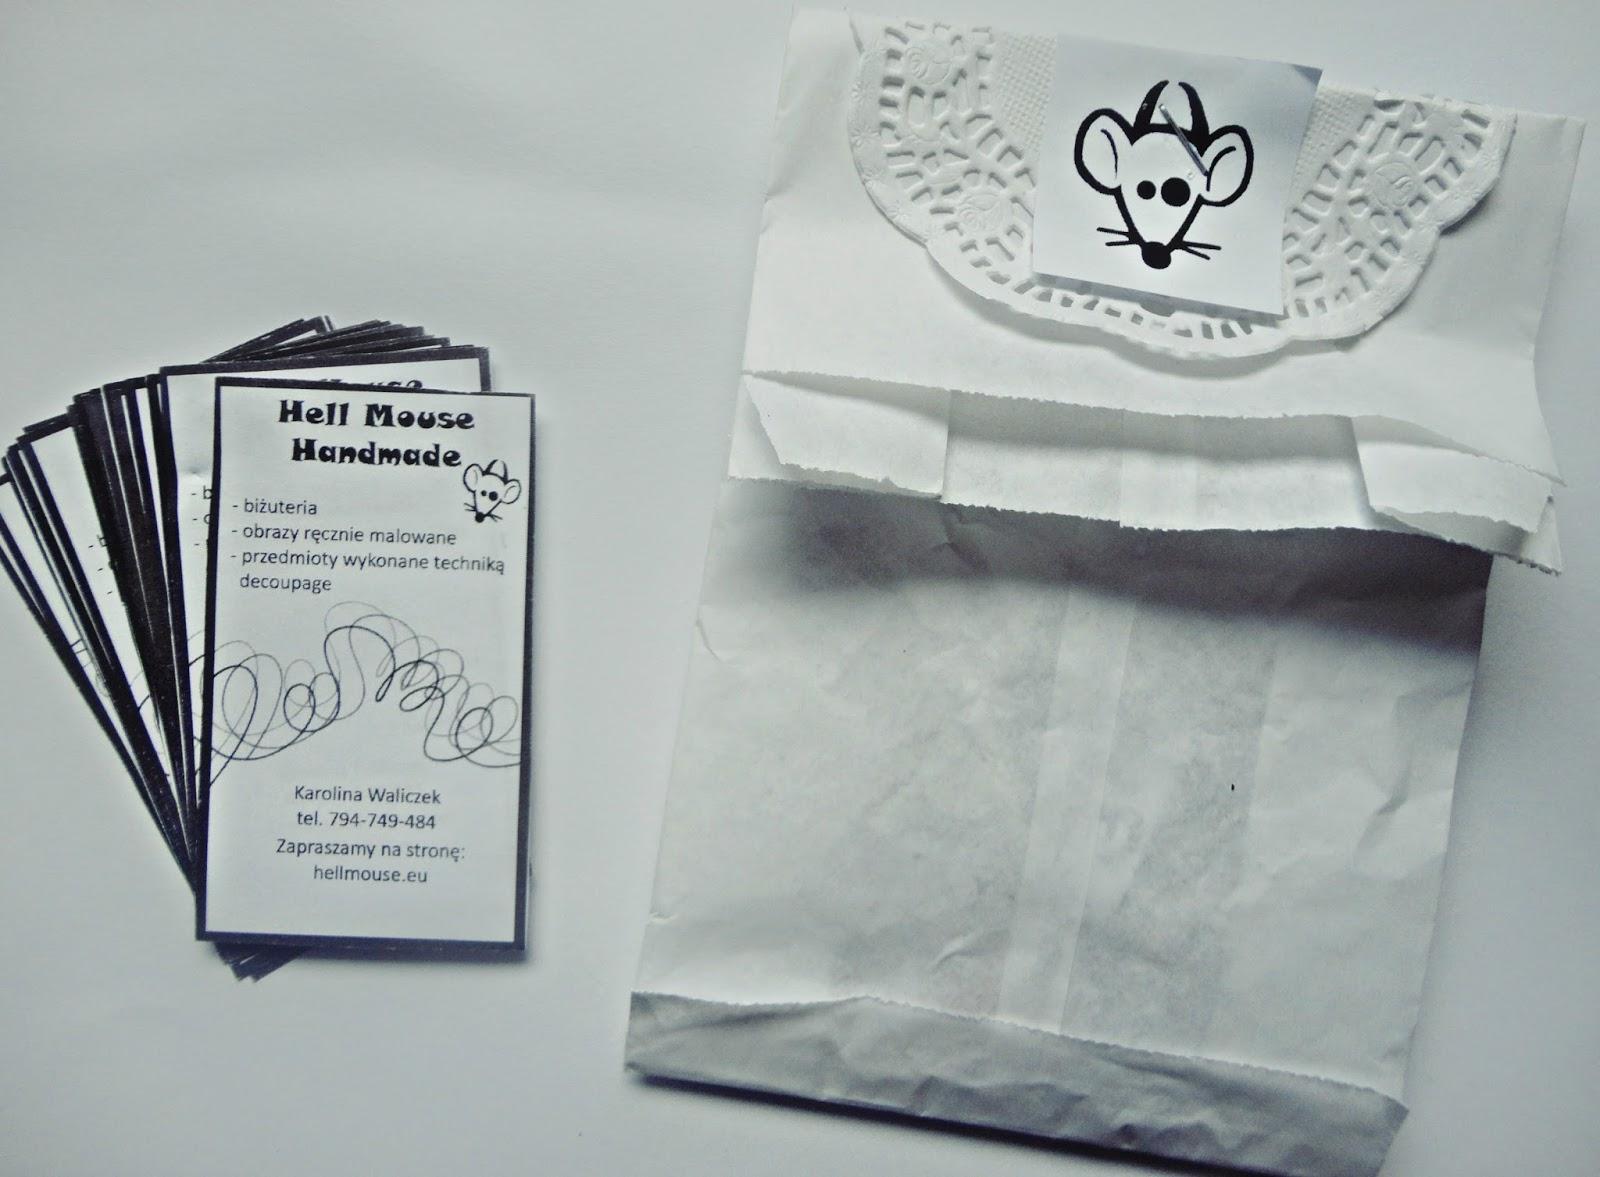 ☂ HellMouse - biżuteria handmade.